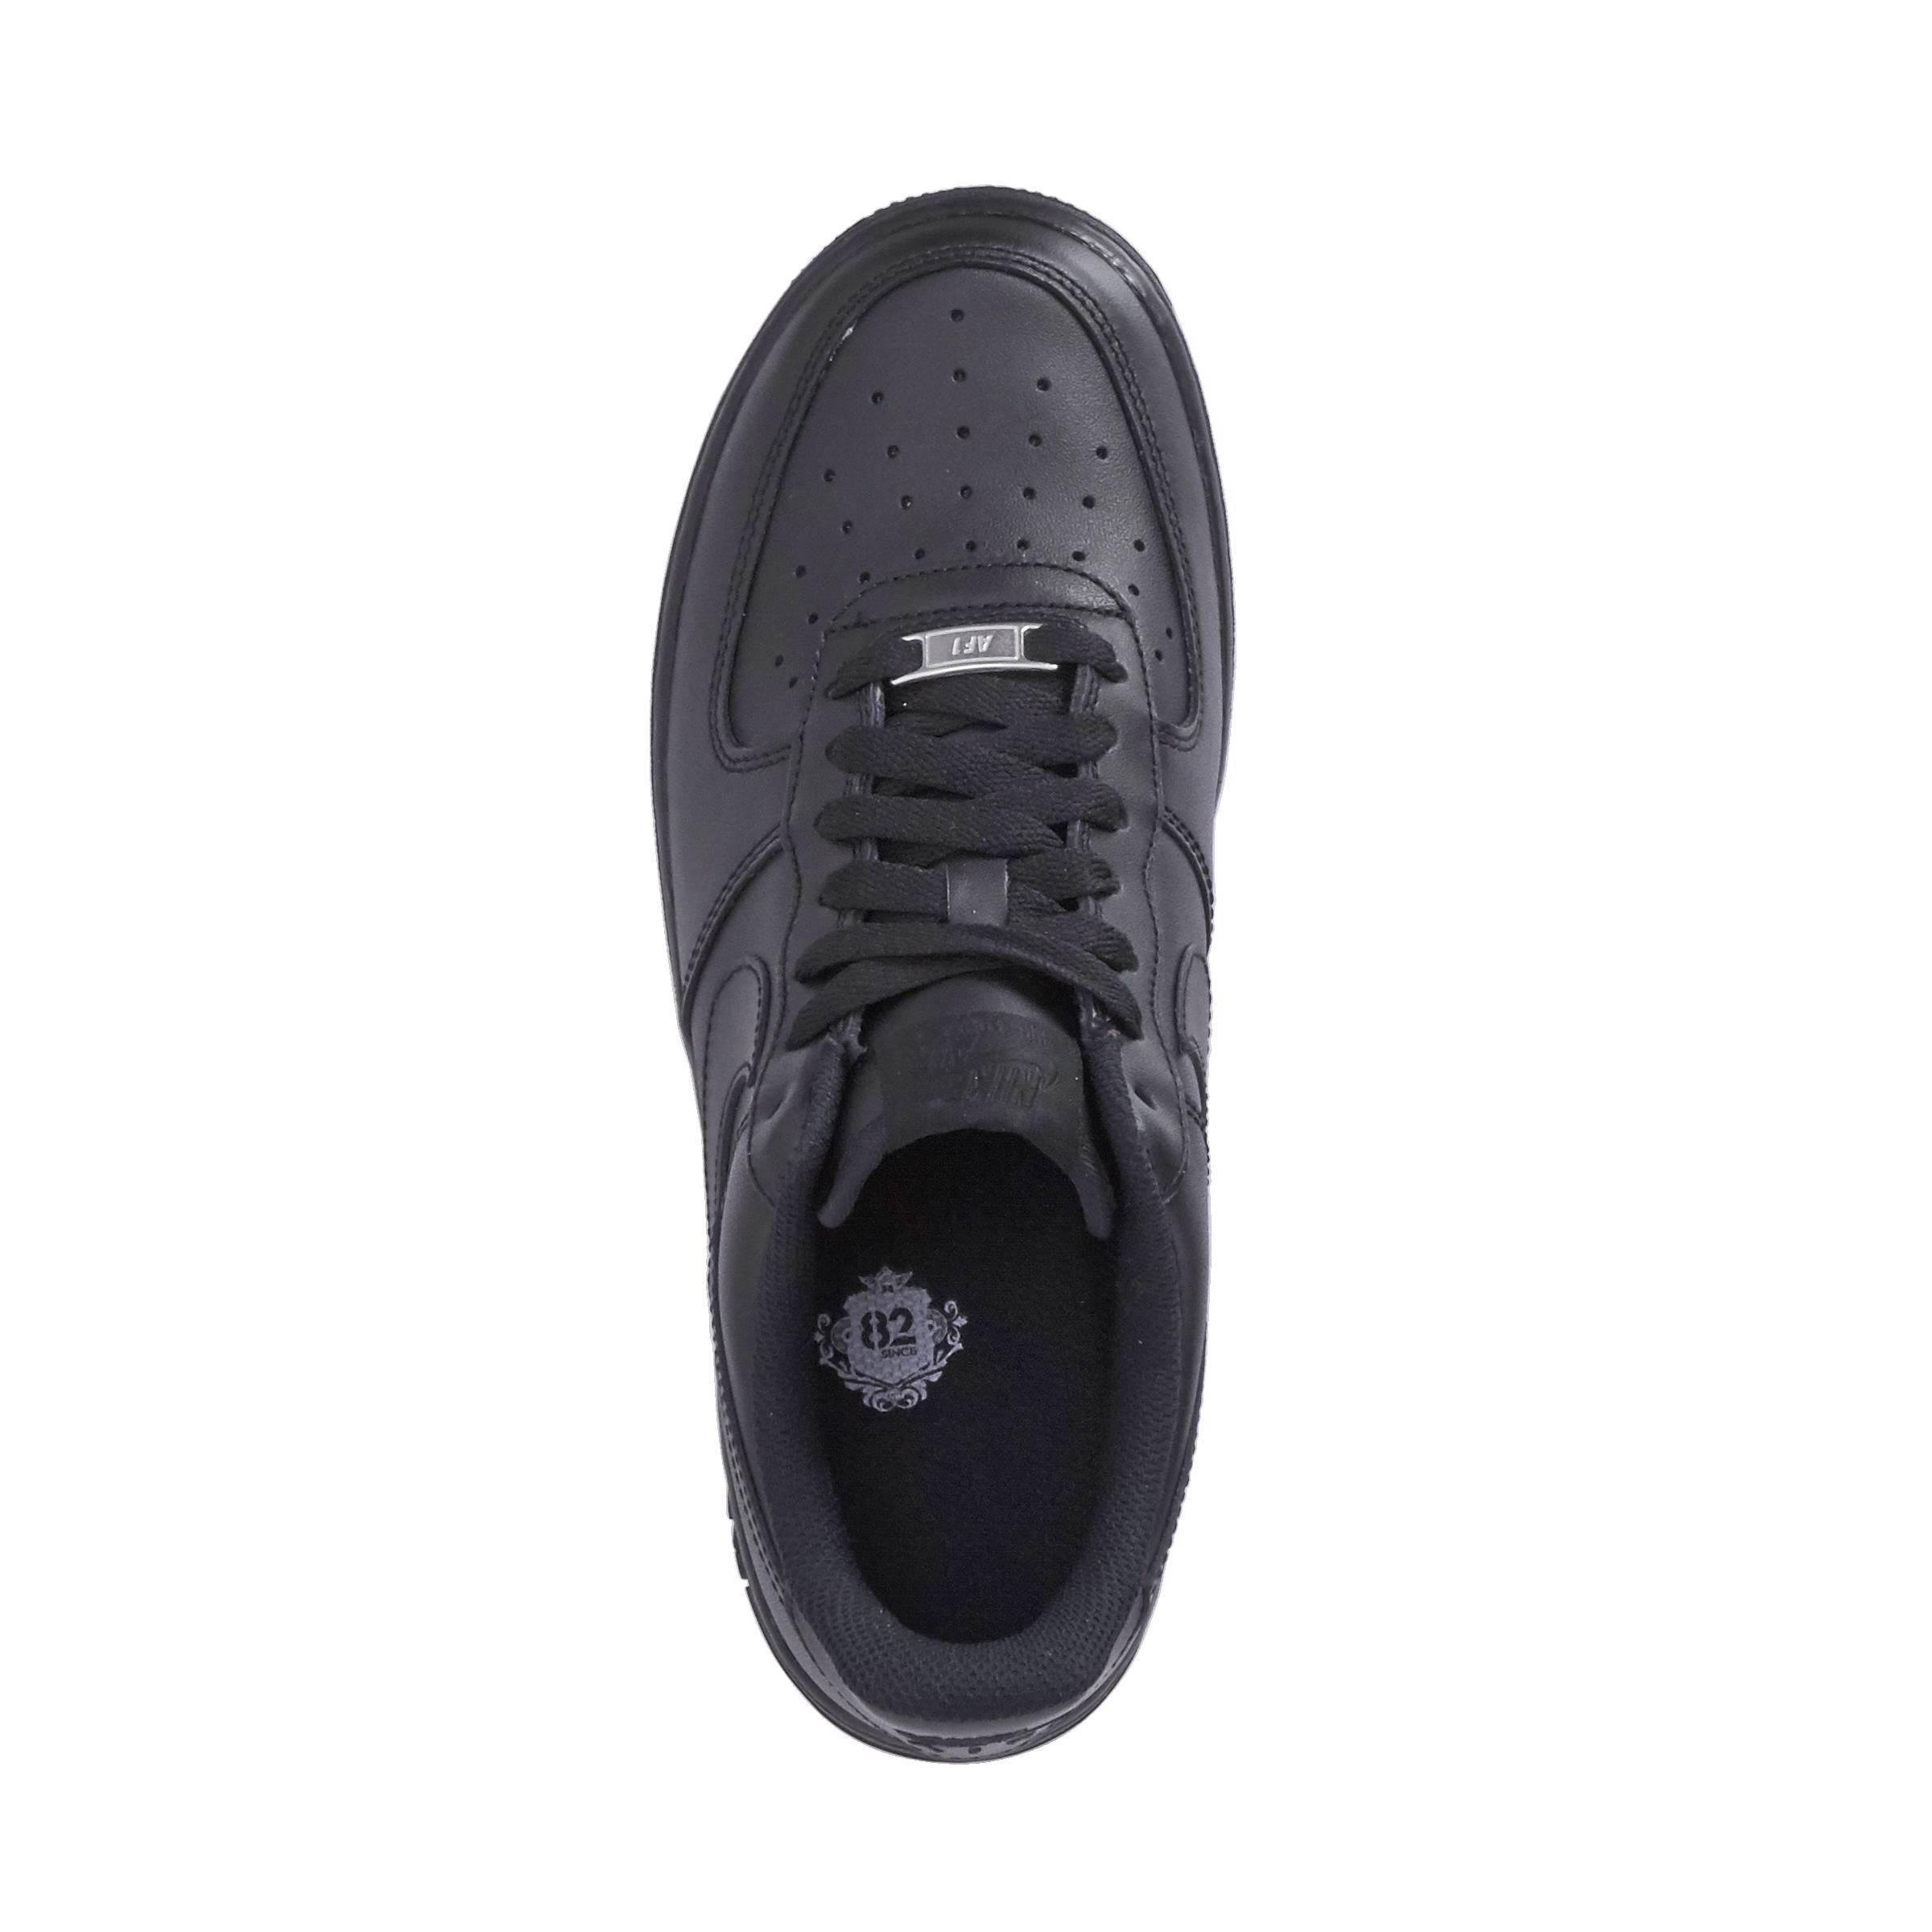 Force Wehkamp Sneakers Air Nike 1 '07 5nB4SqO